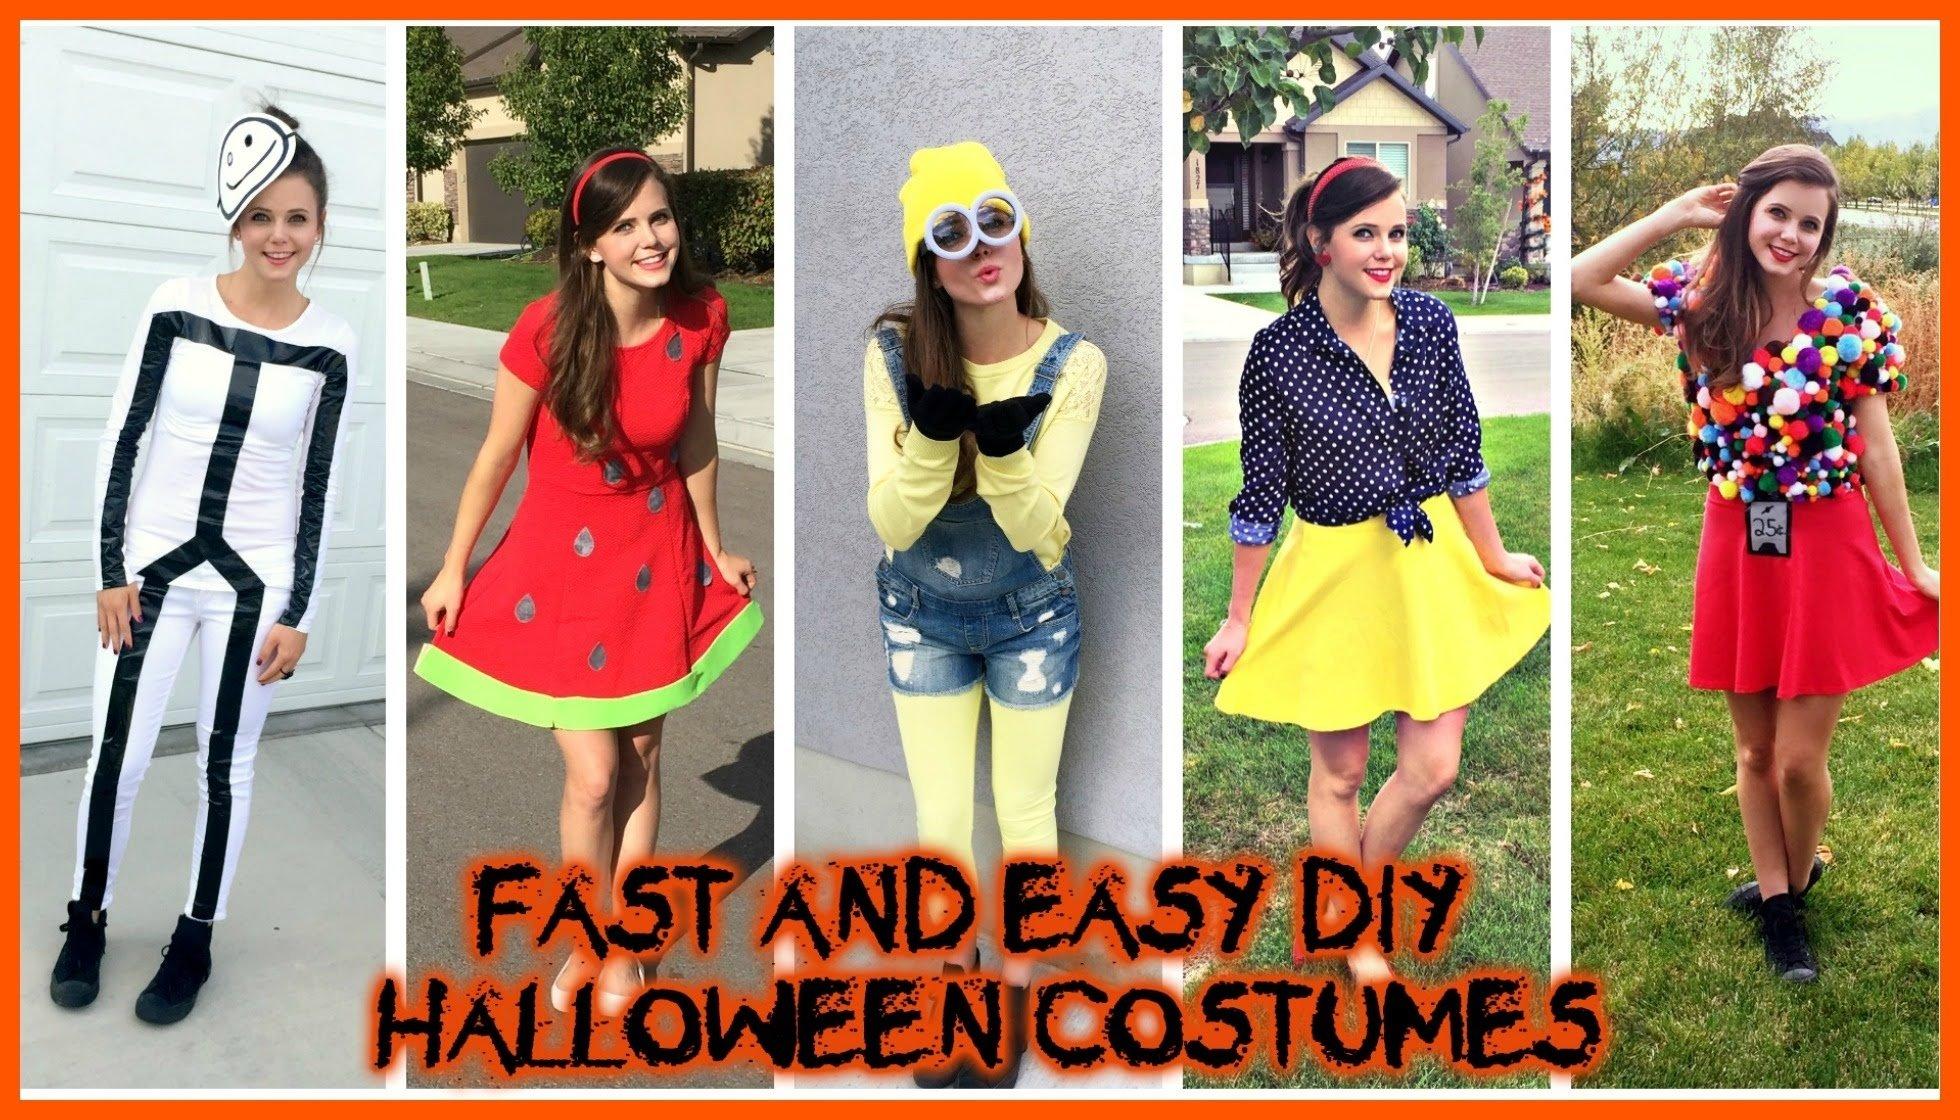 10 Unique Last Minute Costume Ideas Adults diy halloween costumes super easy cheap last minute ideas tiffany 17 2020